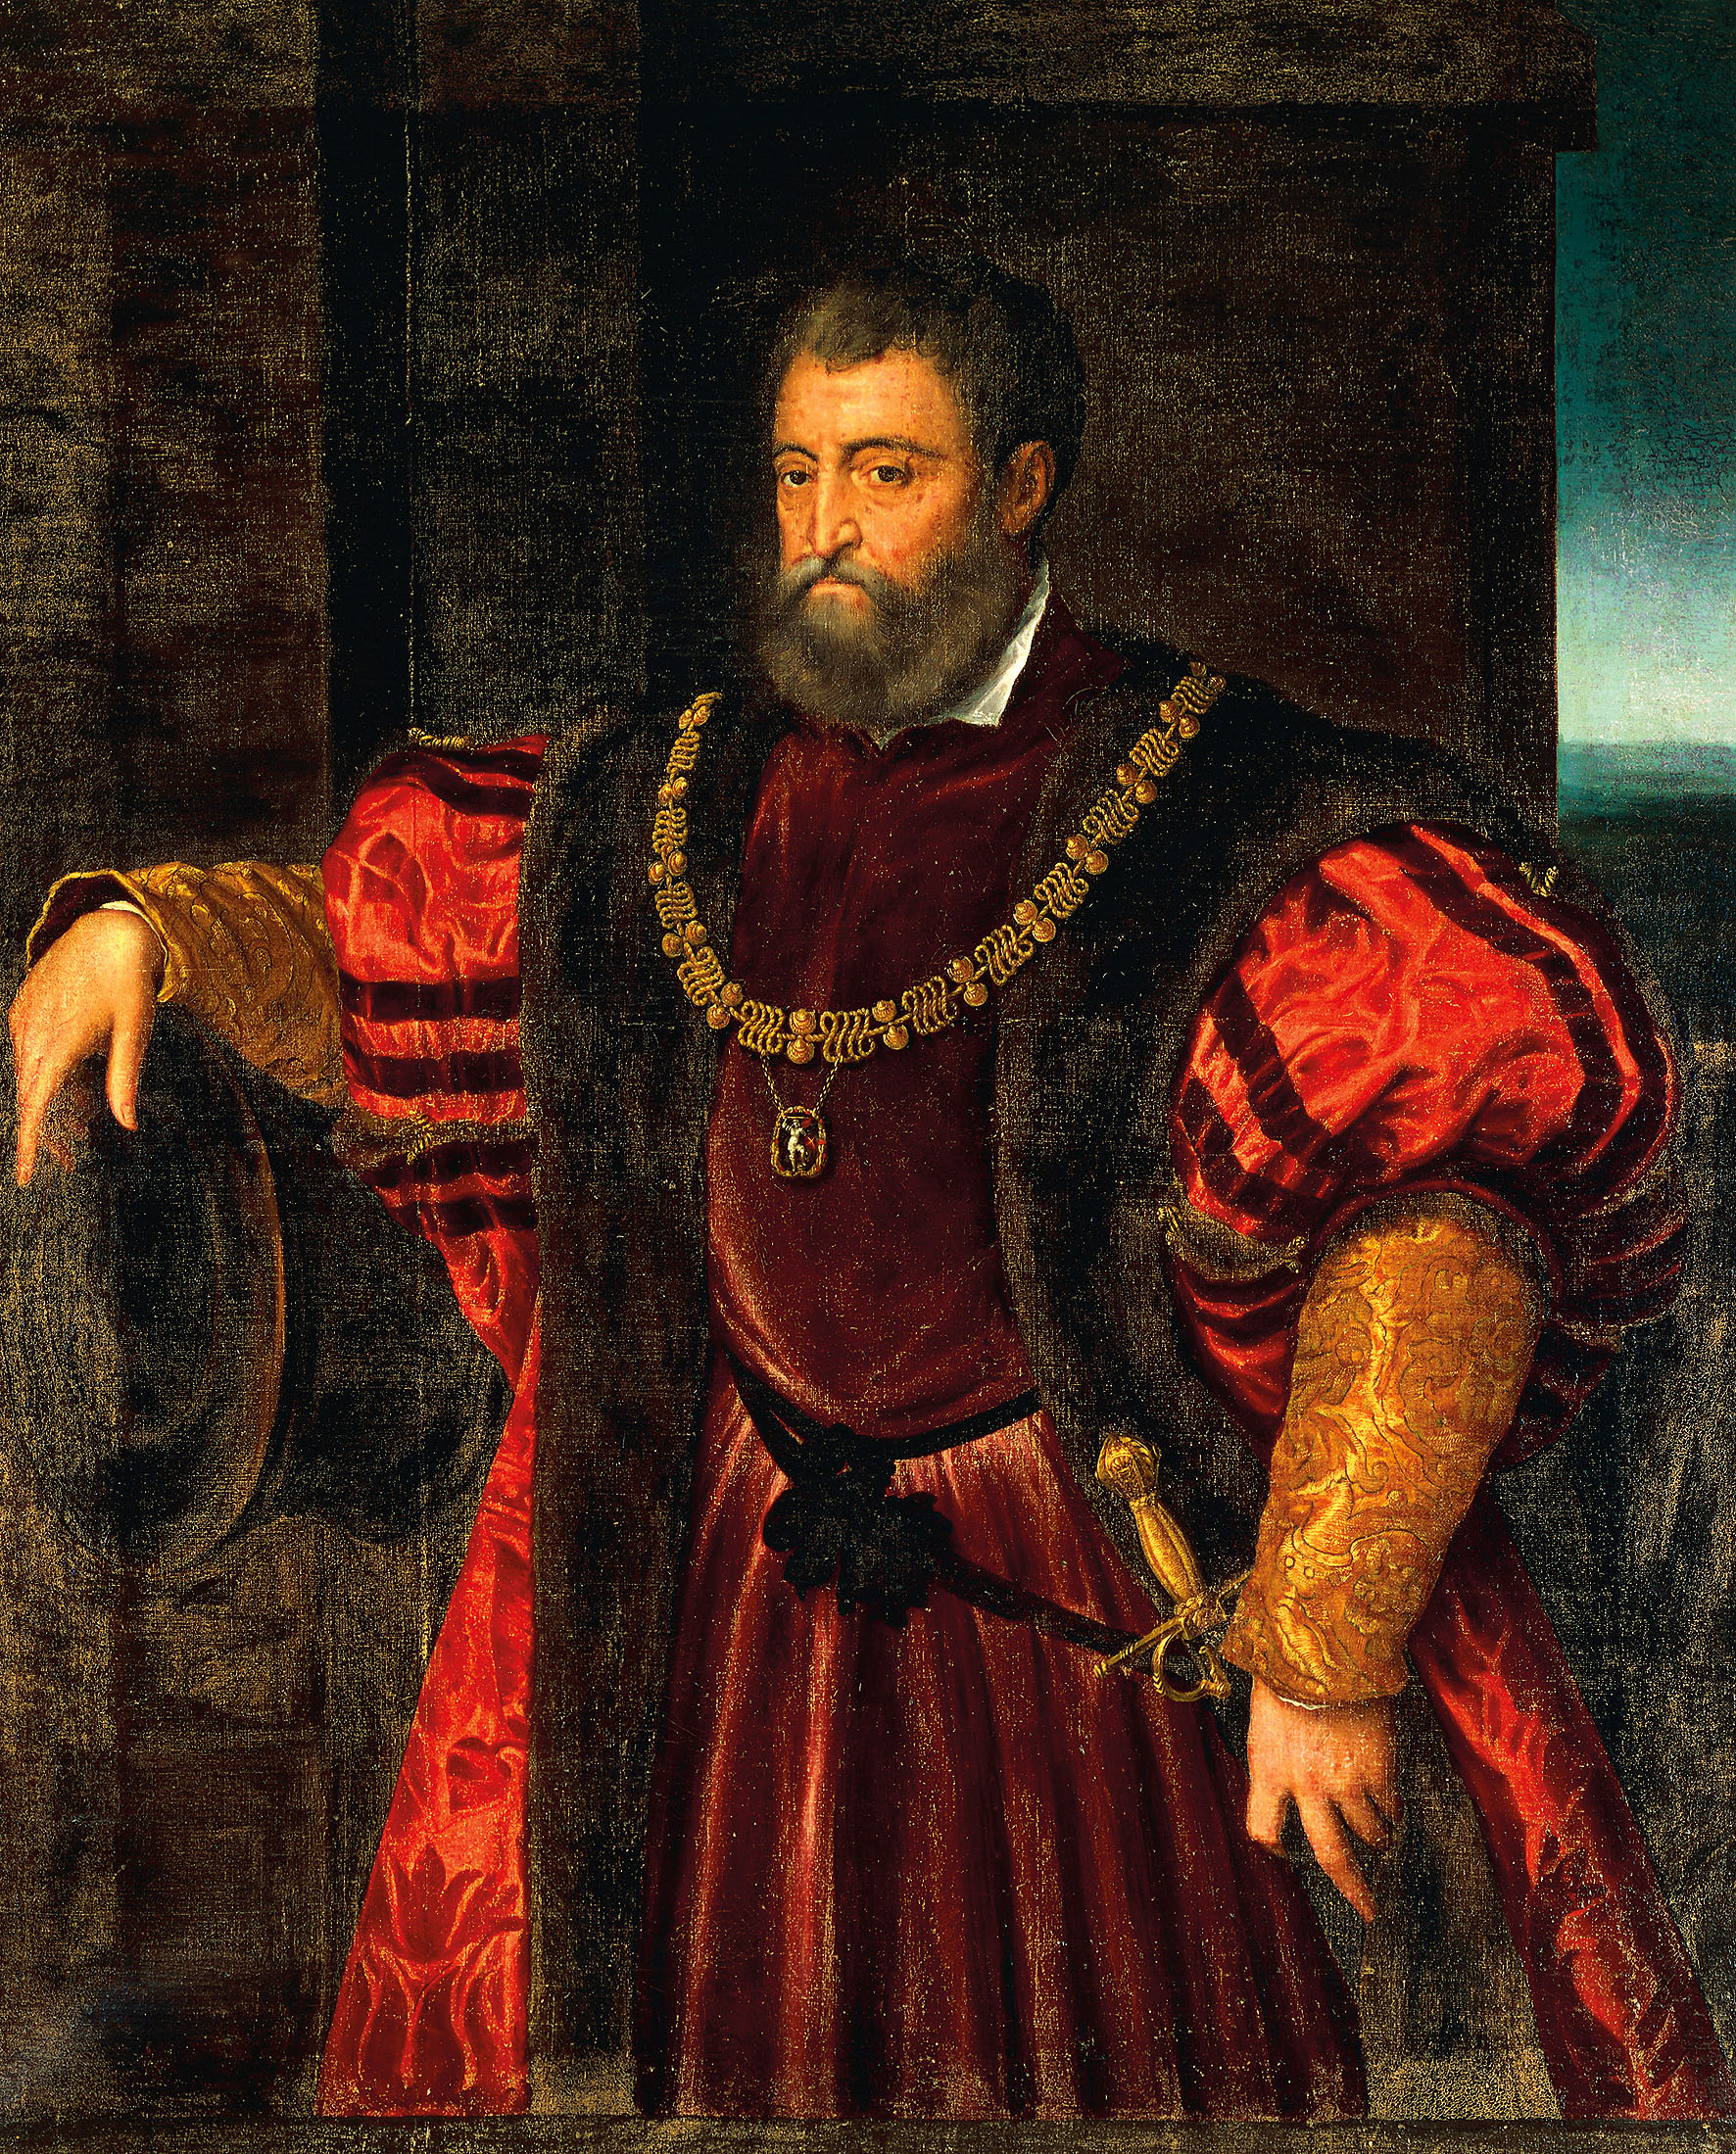 Alfonso d'Este (21 July 1476 – 31 October 1534) was Duke of Ferrara